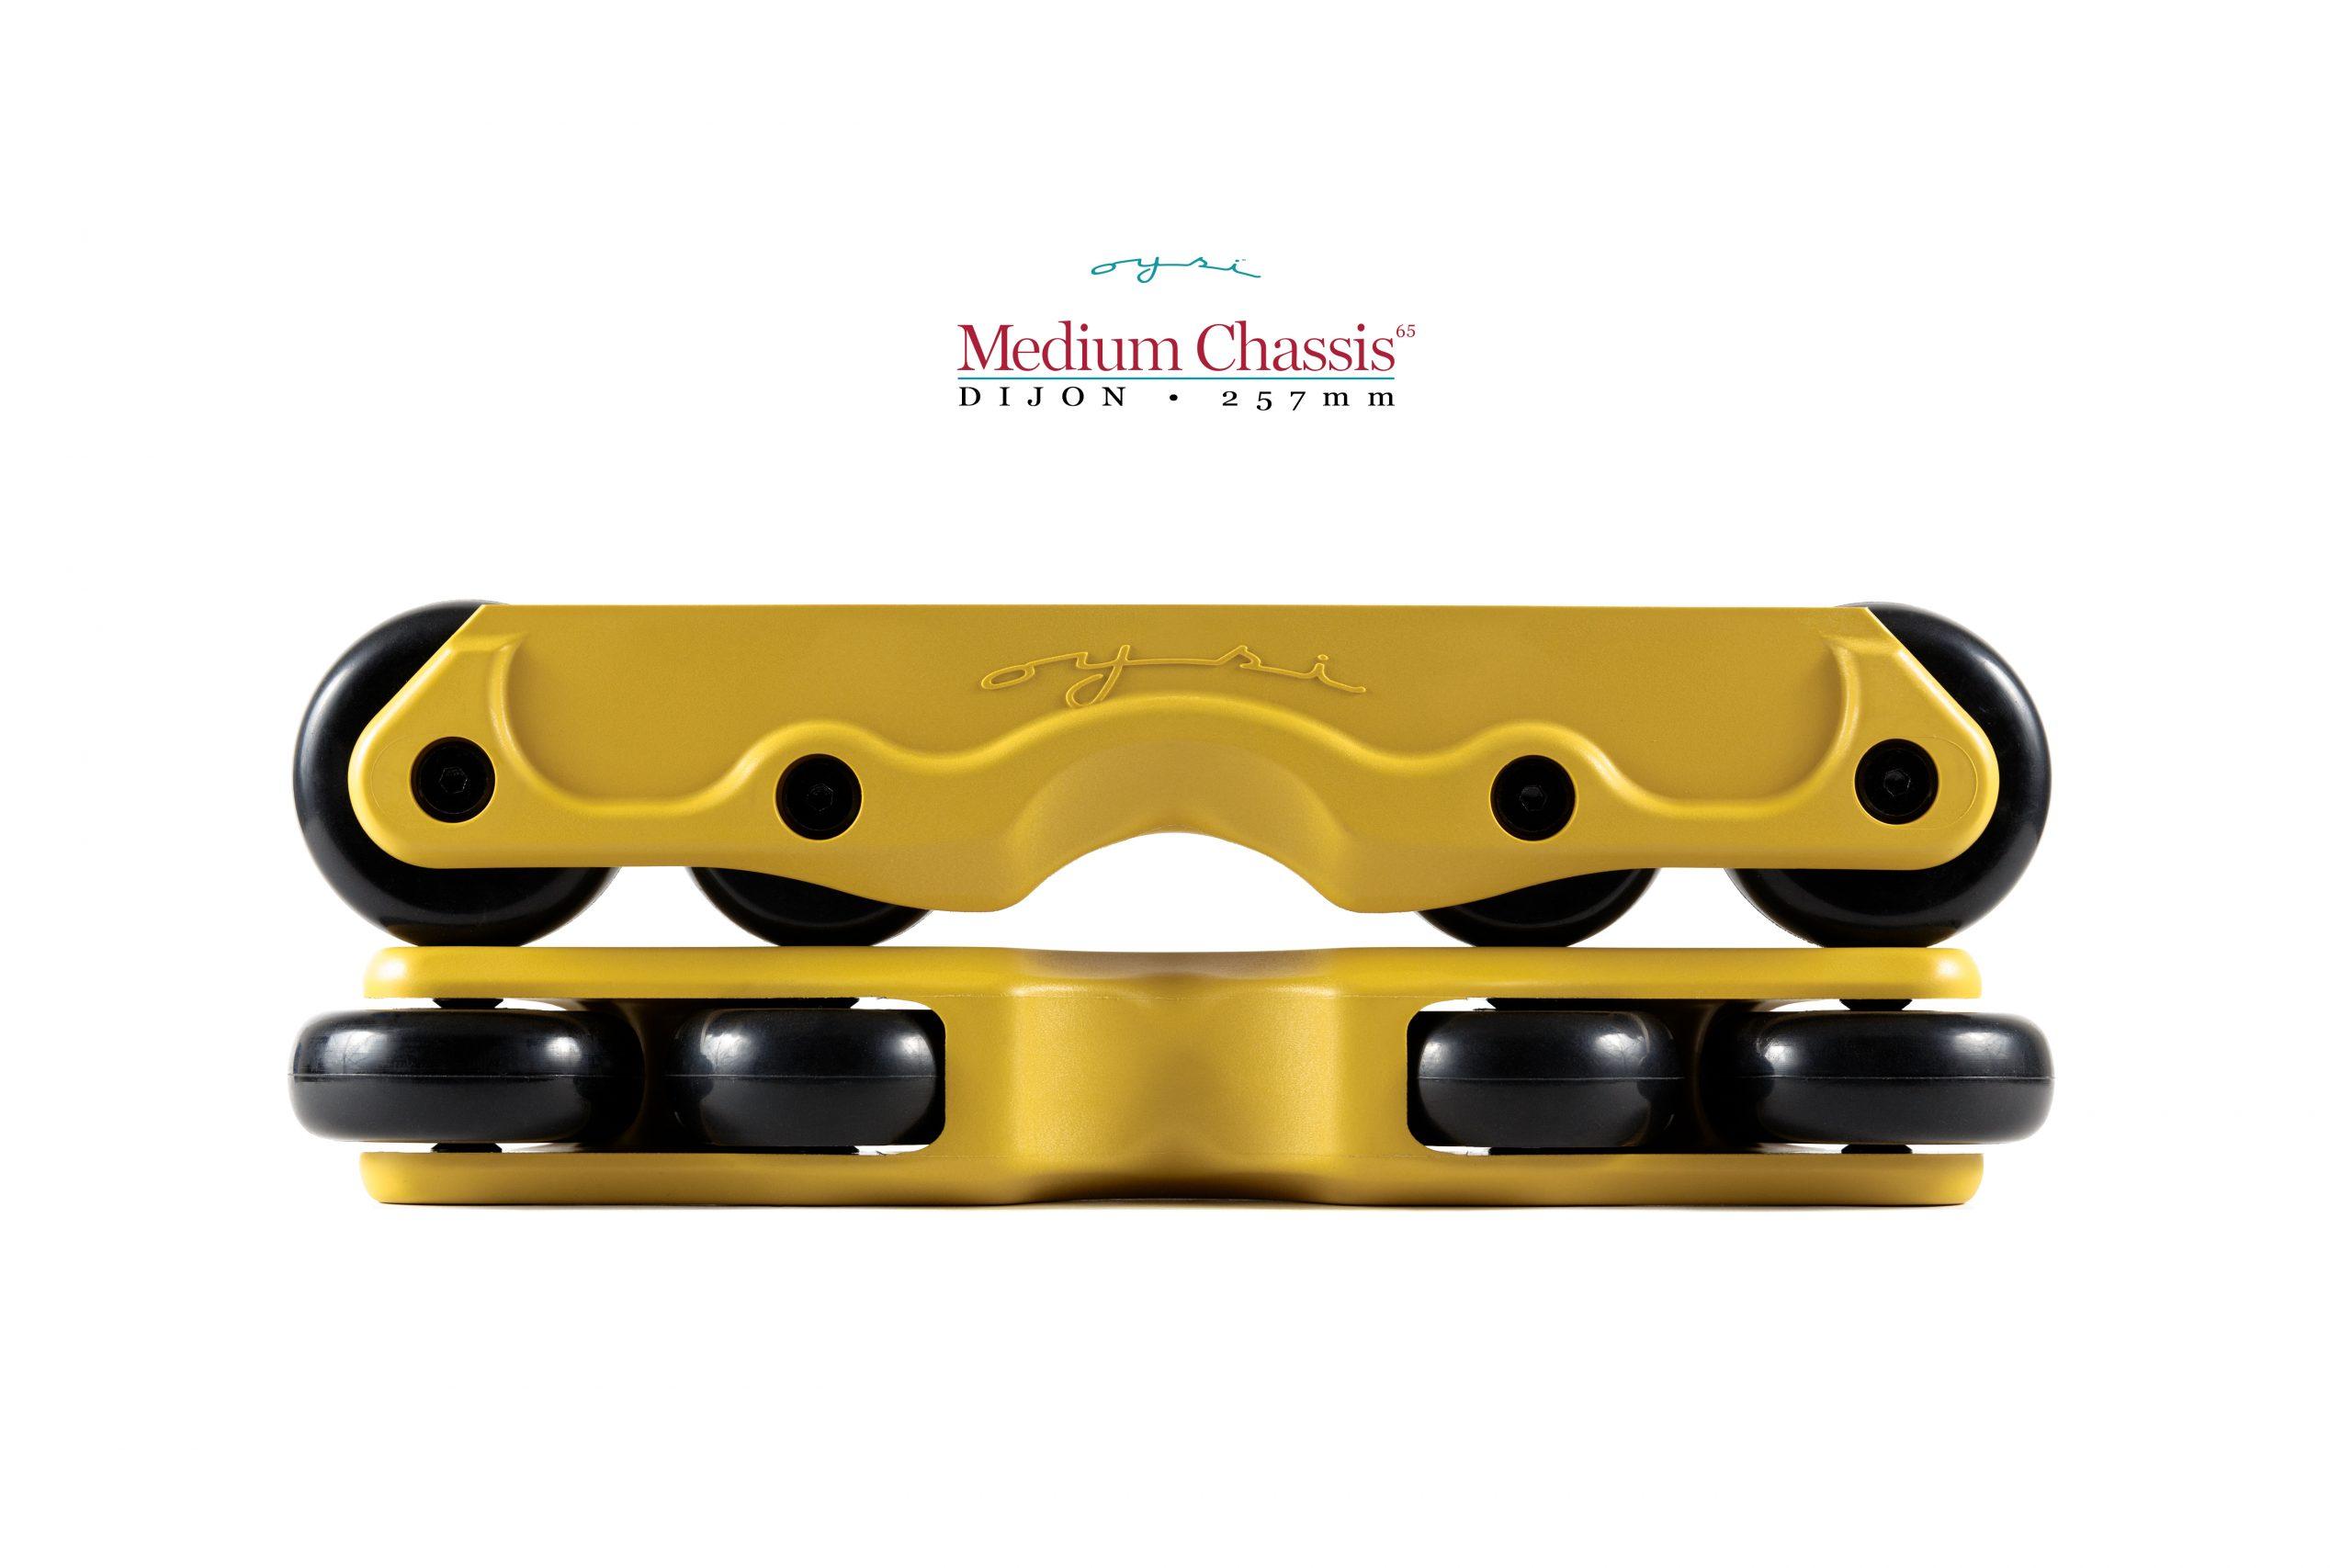 Oysi Medium Chassis - Dijon